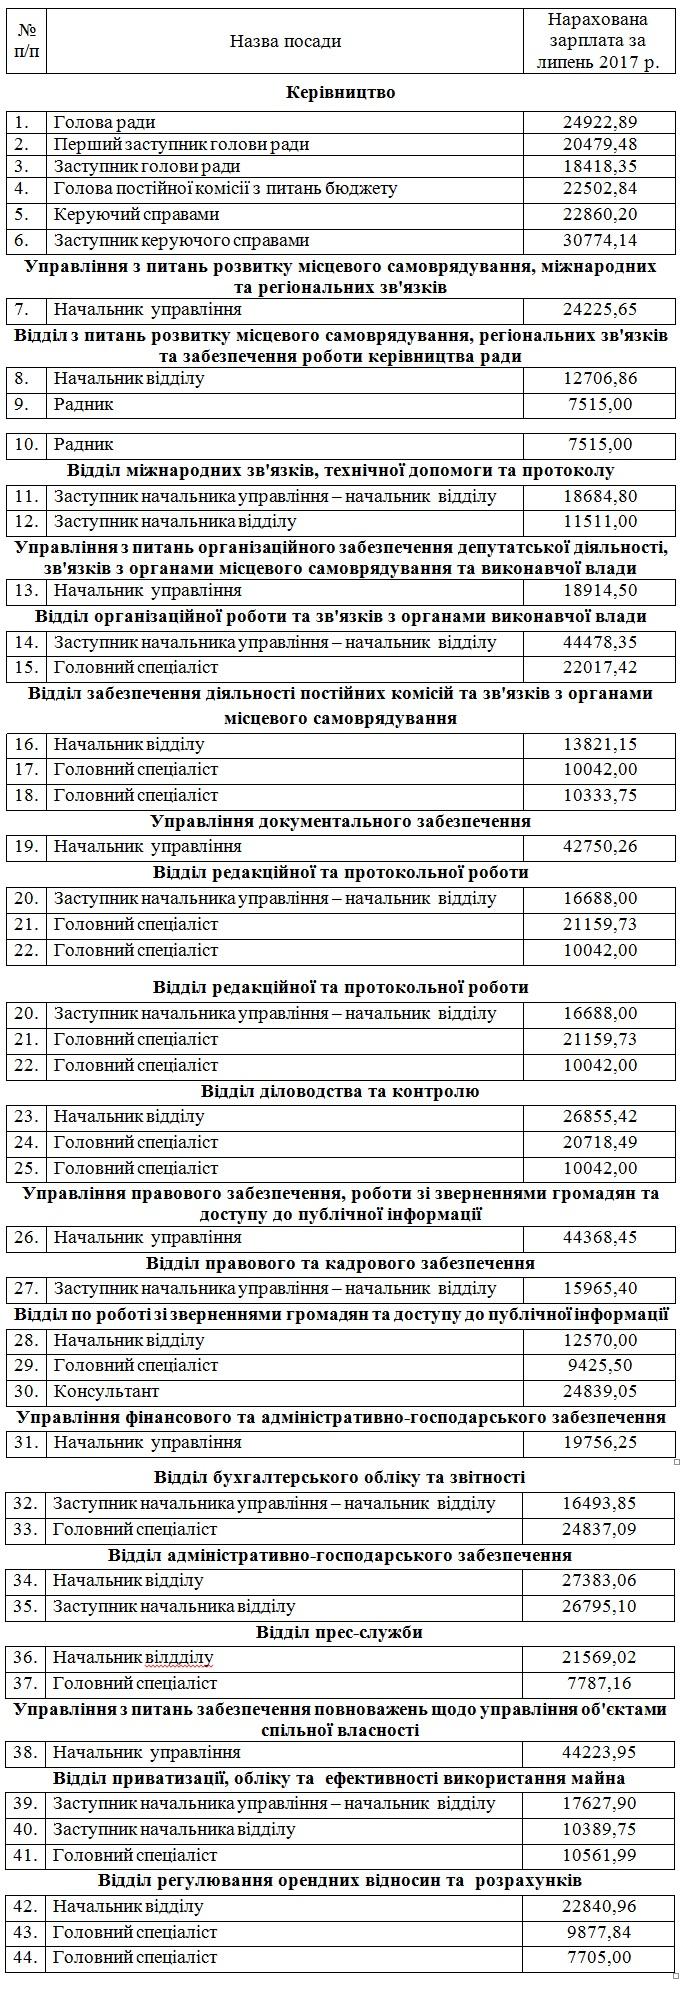 У Закарпатській облраді міністерські зарплати